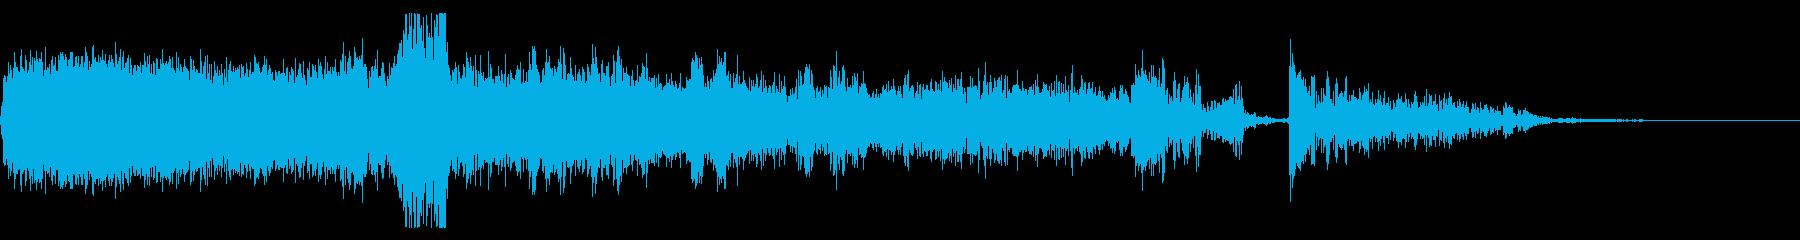 FMラジオ的ジングル15の再生済みの波形